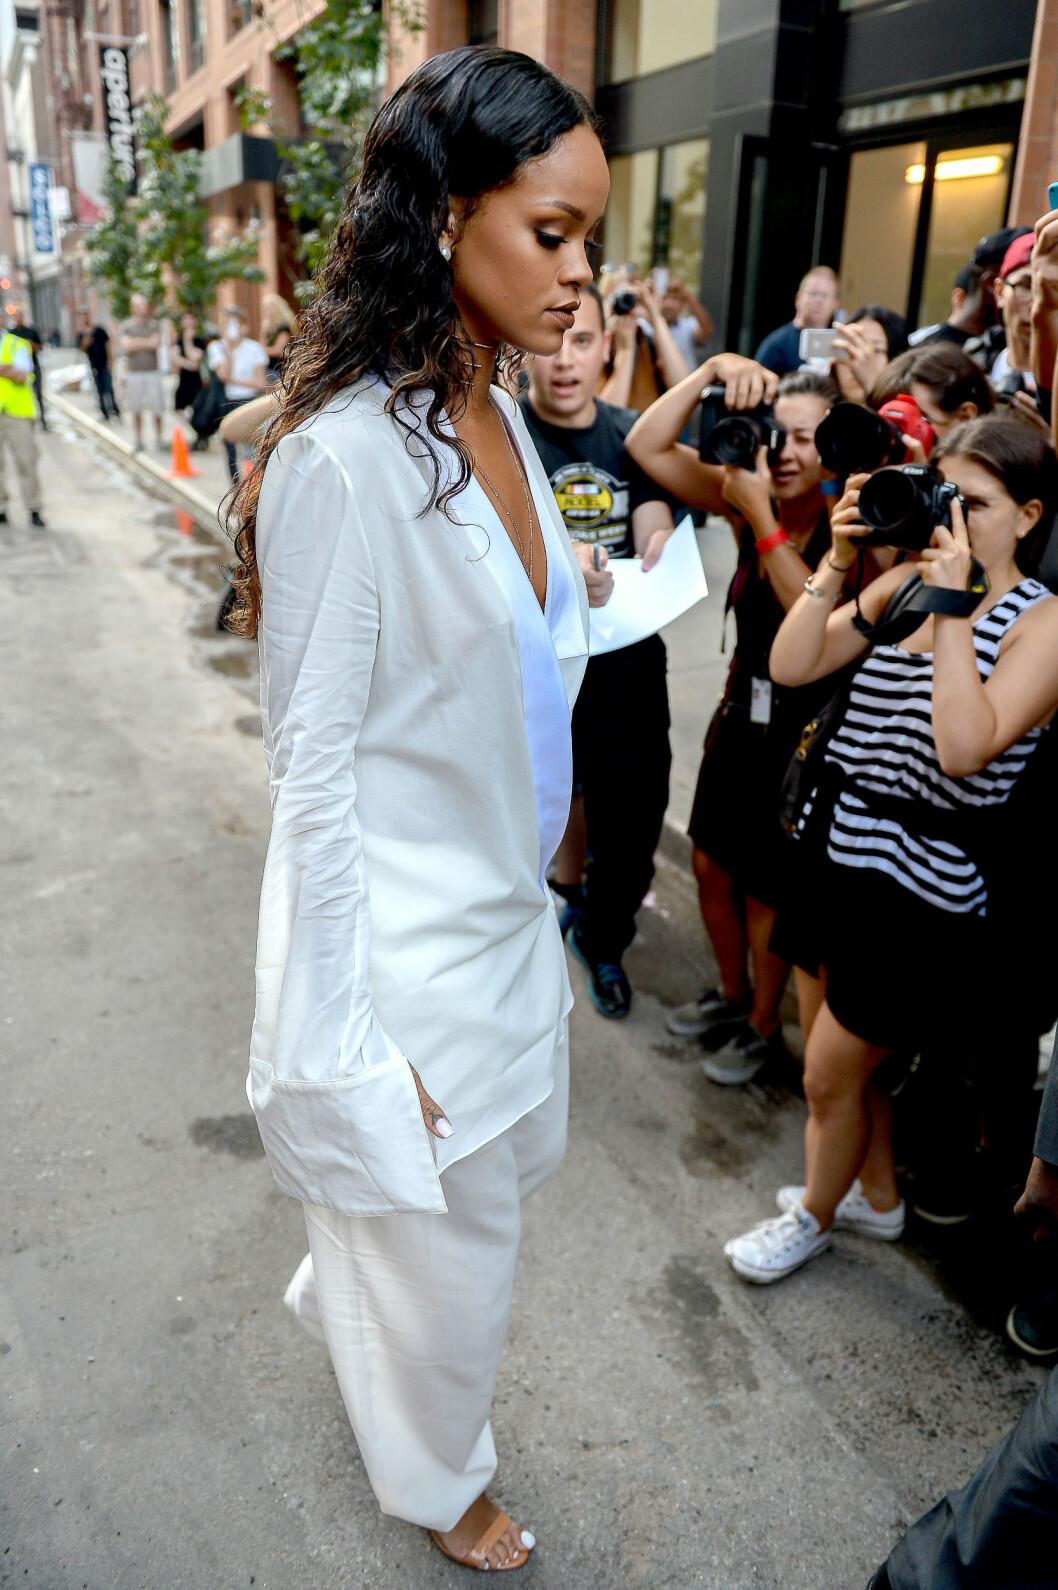 HVITT + NUDE: Rihanna i helvhvit dress fra Edun under New York Fashion Week. Foto: REX/D. DaSilva/All Over Press